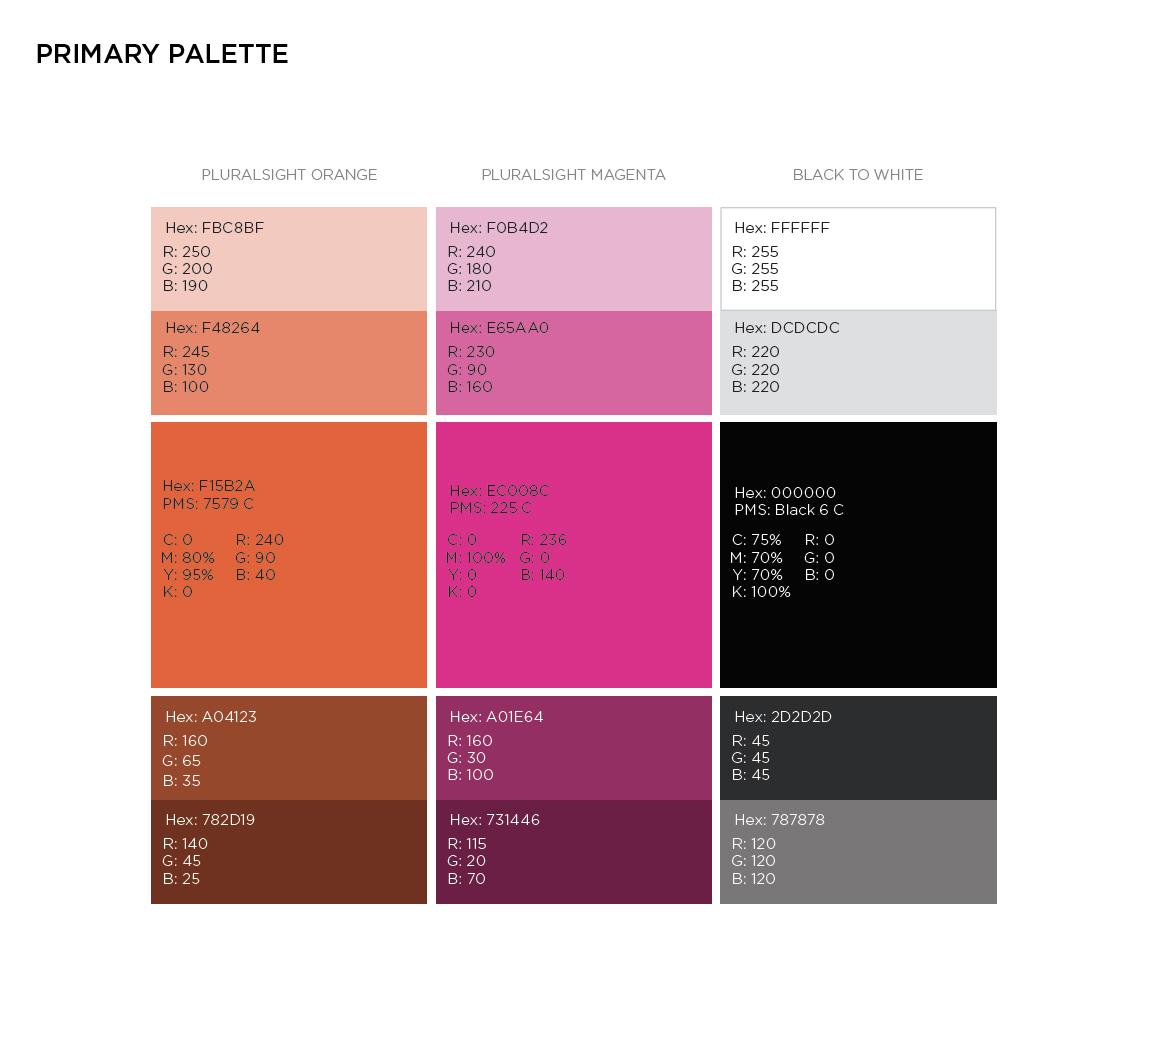 Pluralsight Colors